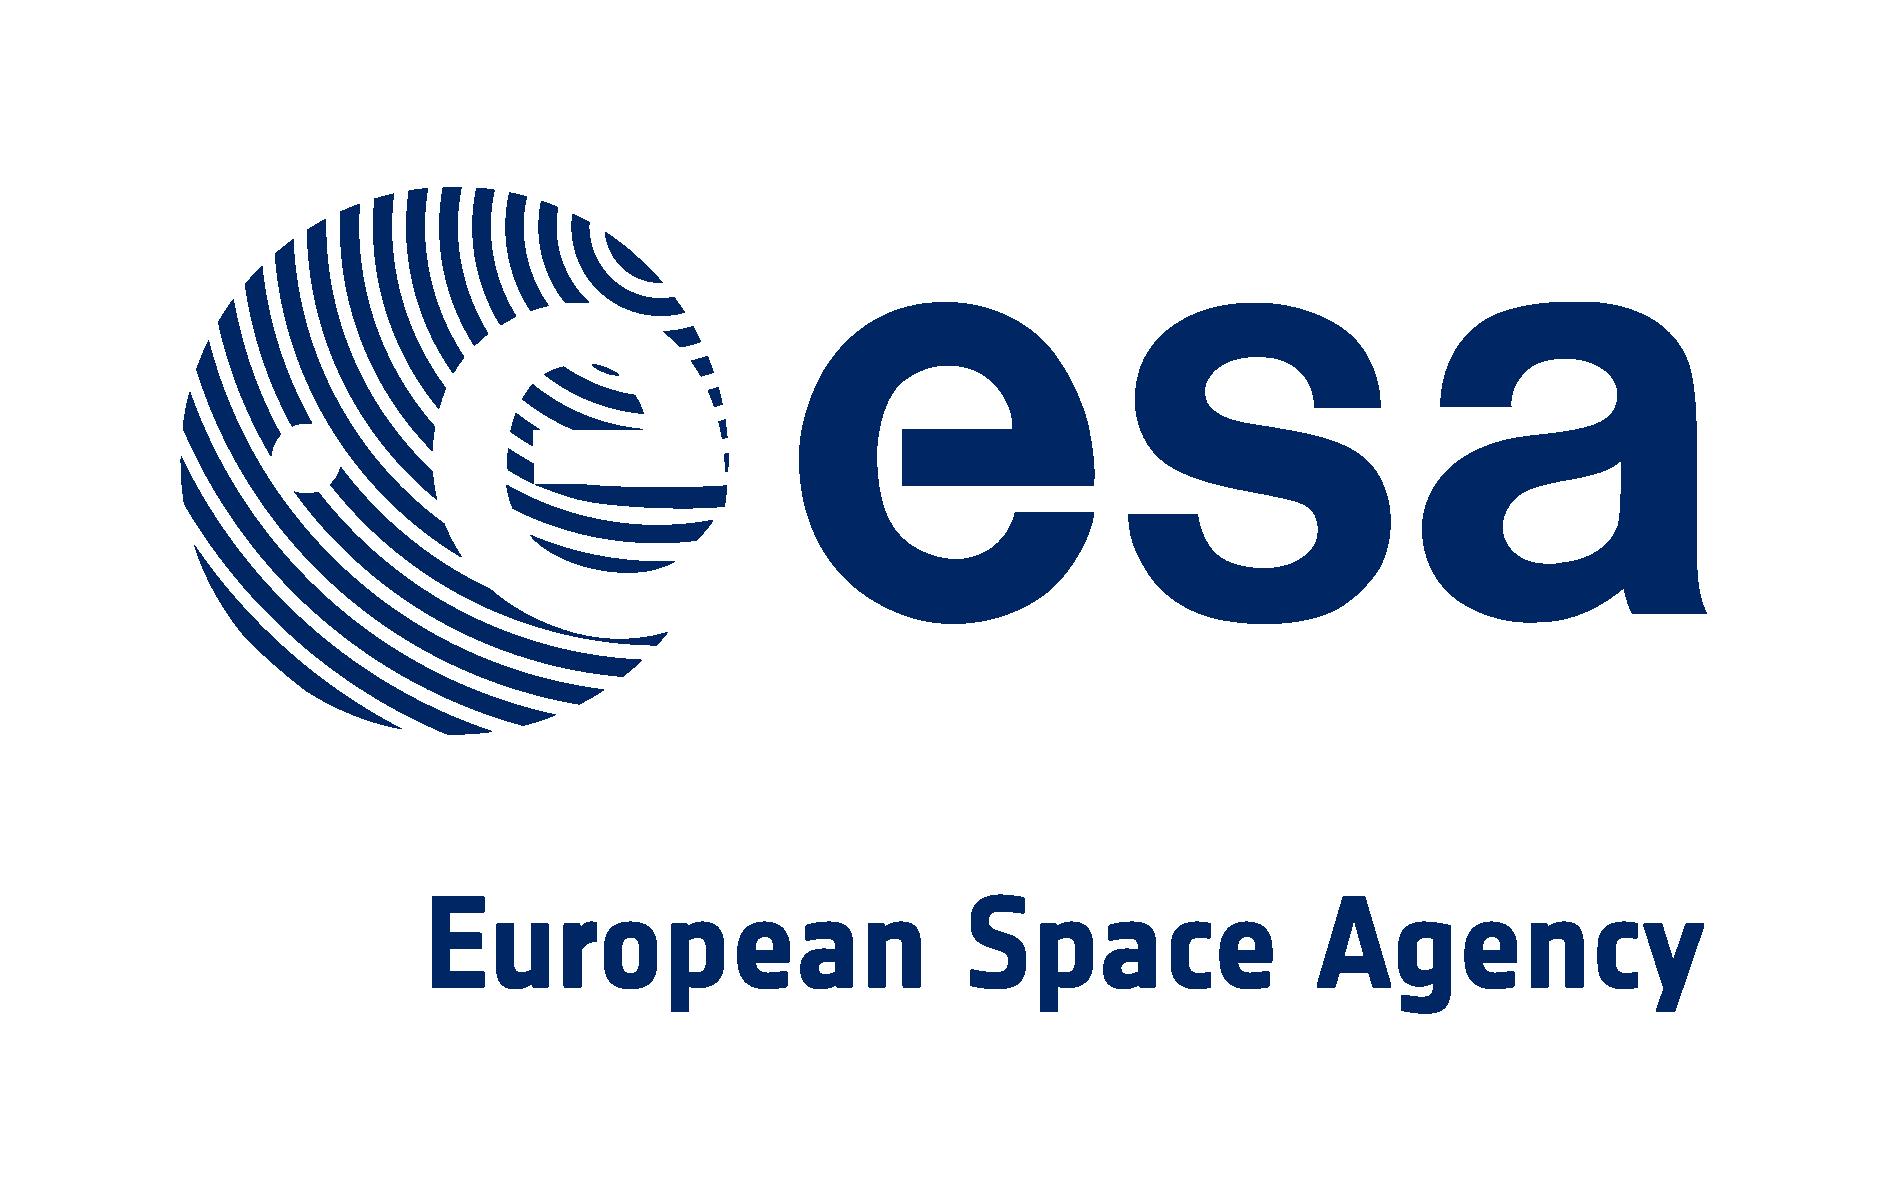 European-Space-Agency-logo.png